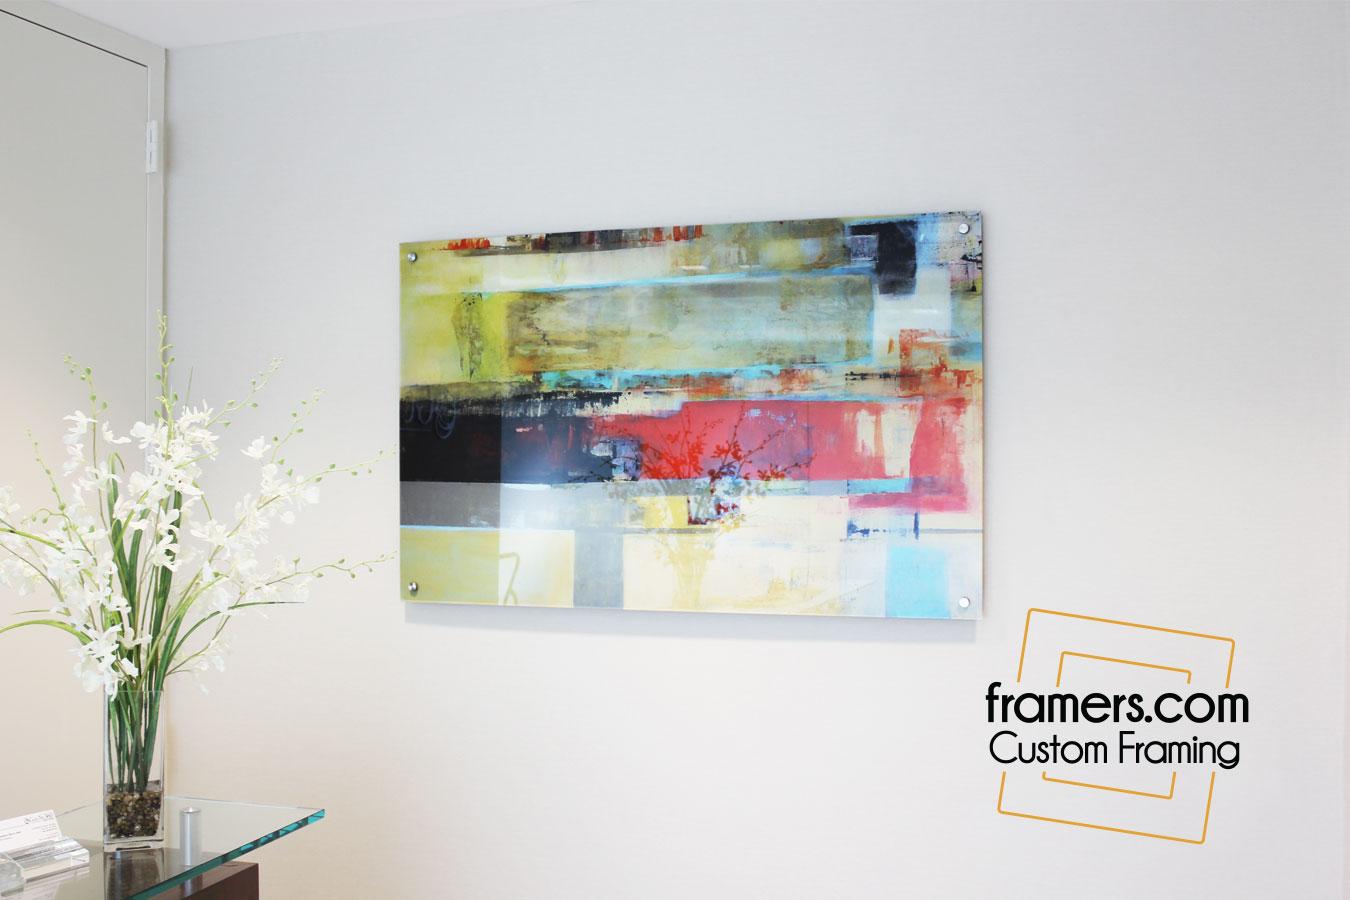 Acrylic Photo framing team